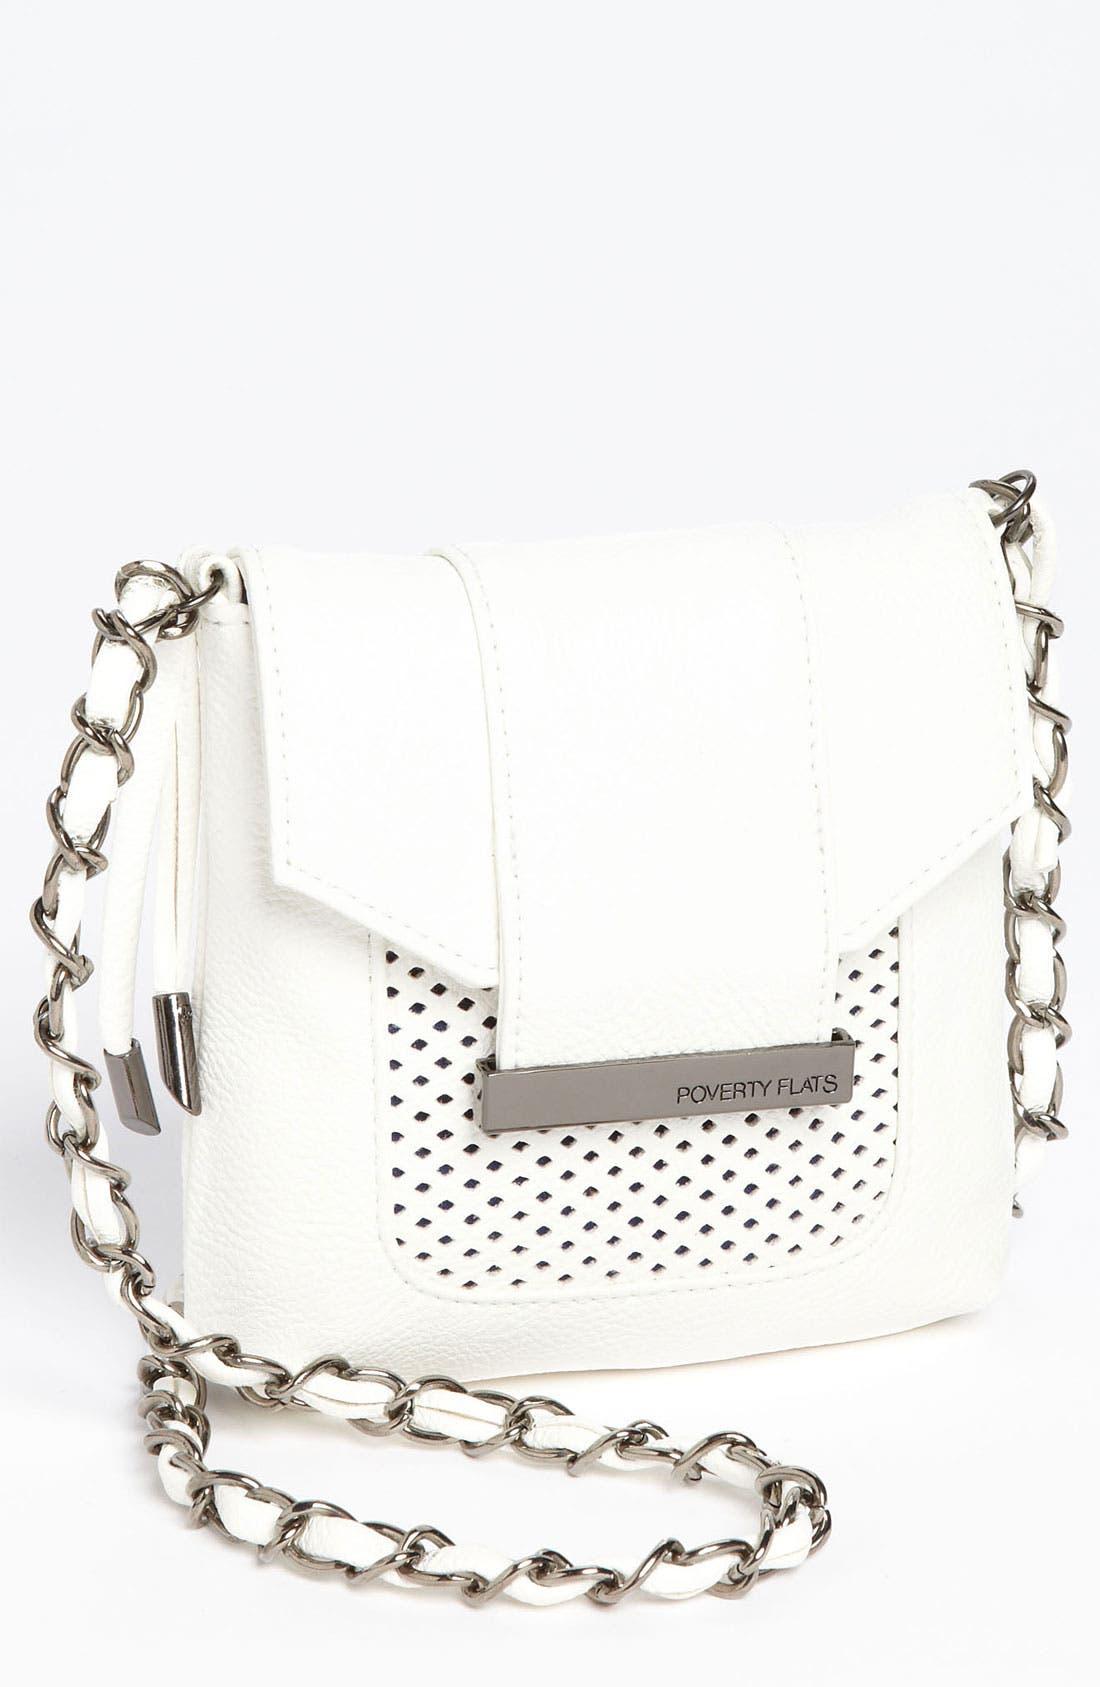 Main Image - POVERTY FLATS by rian 'Mesh Detail - Mini' Crossbody Bag